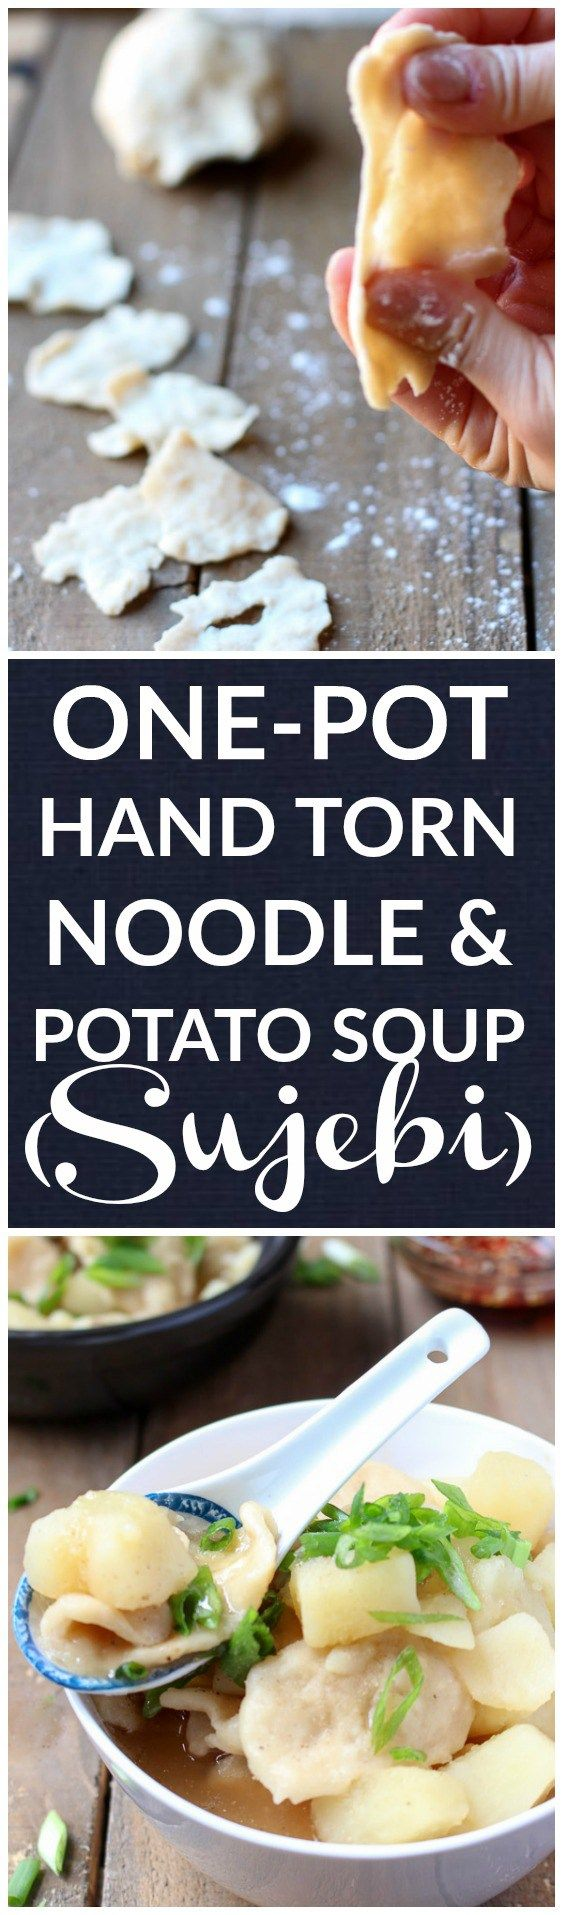 Follow this easy recipe to make delicious Korean one-pot hand torn noodle potato soup (Sujebi)!! |www.kimchichick.com